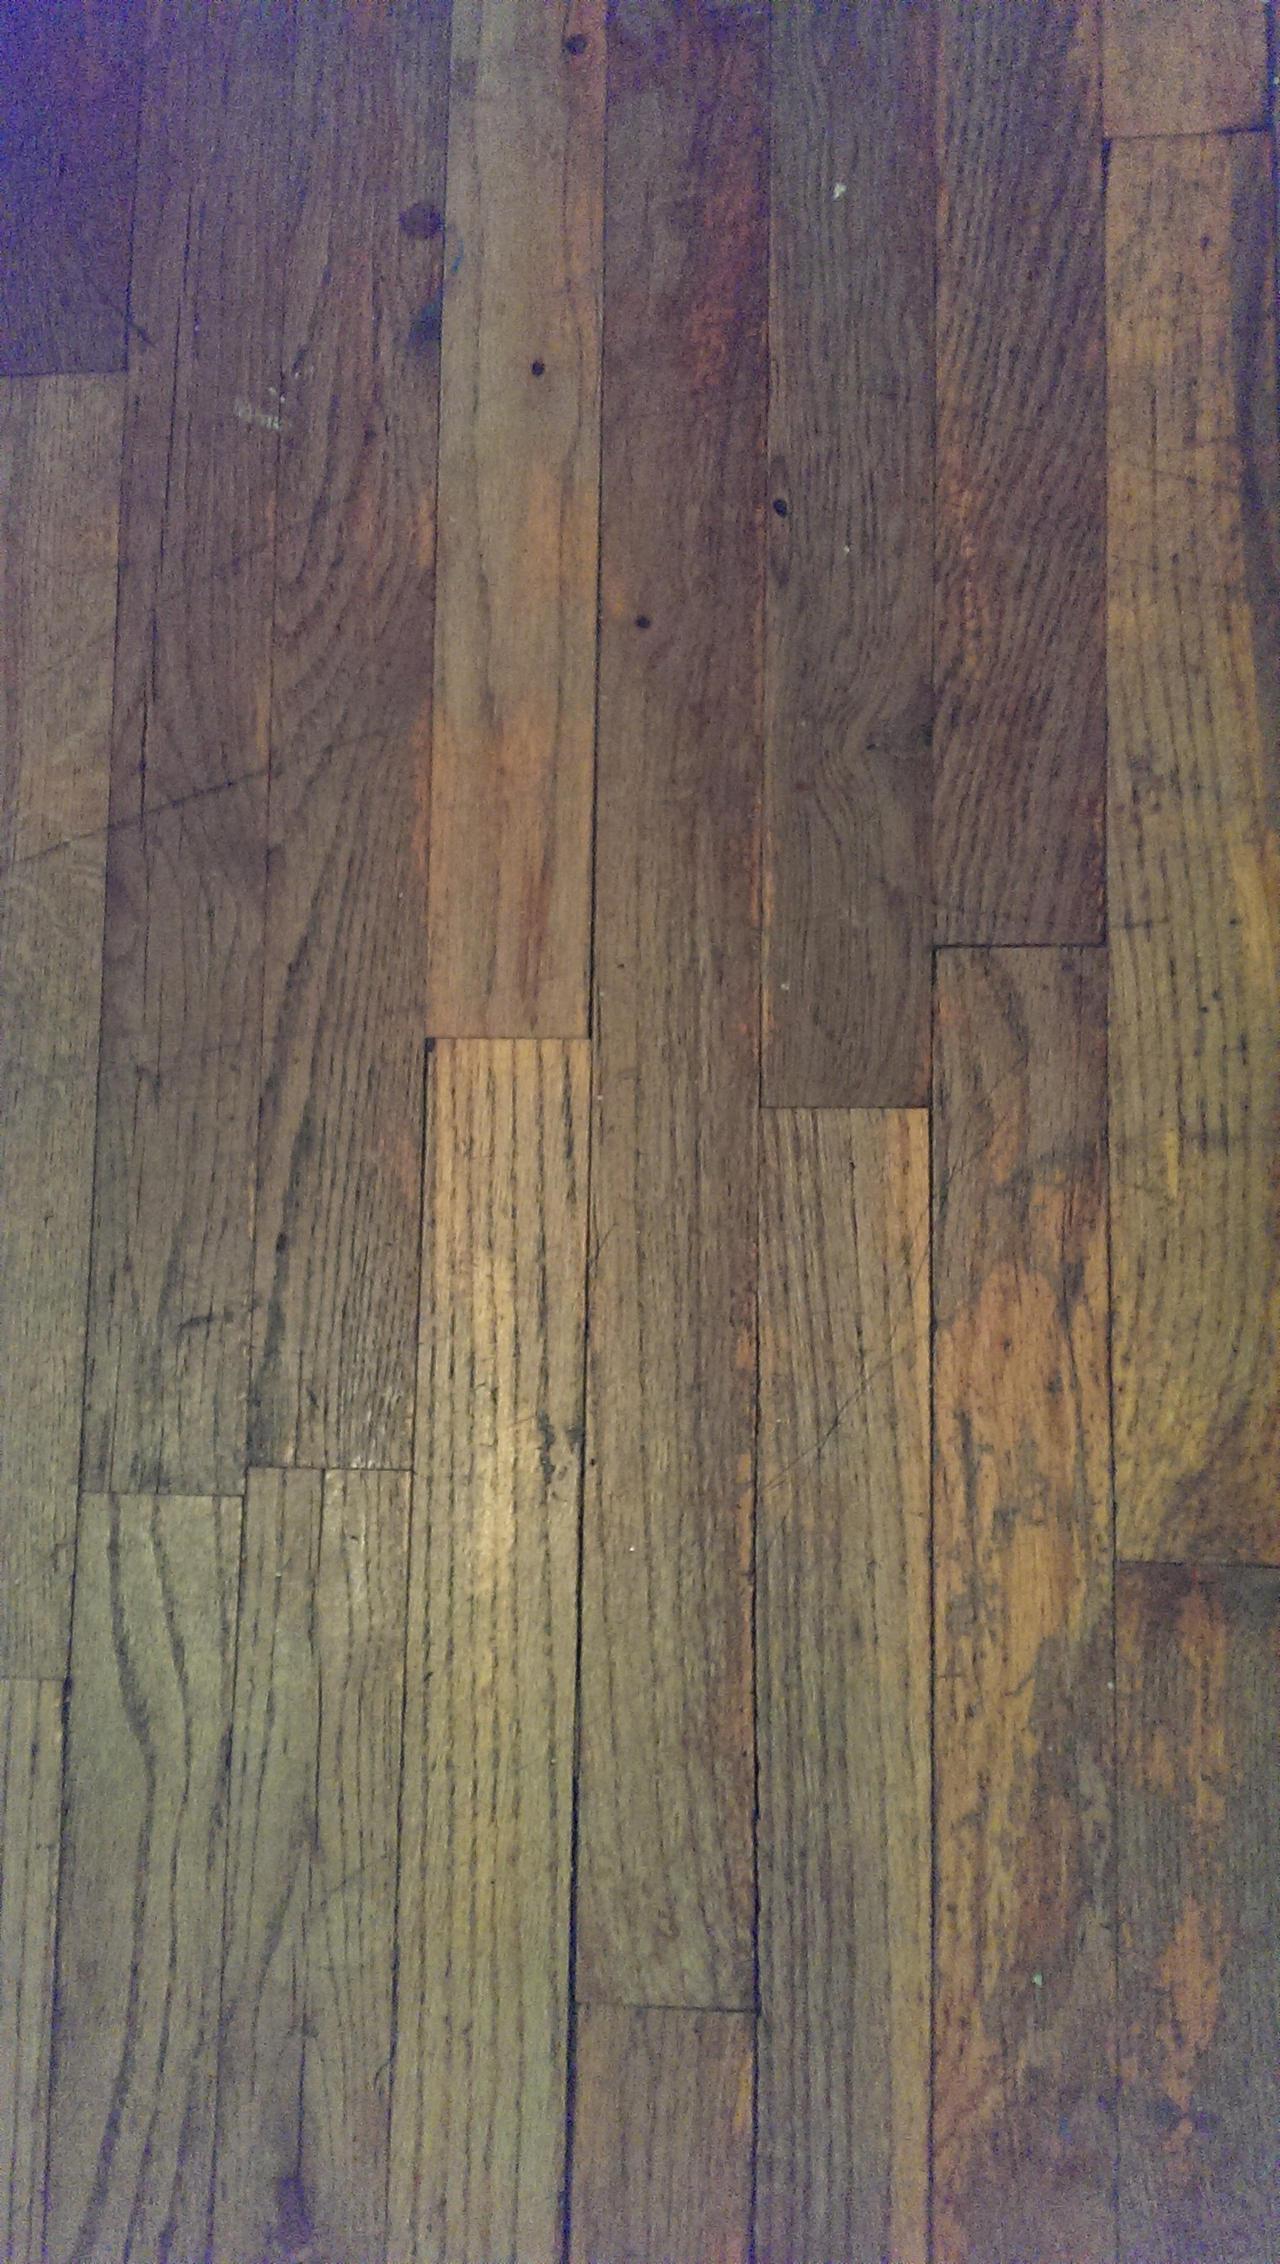 Worn wooden floor texture by bleubear on deviantart Worn wood floors